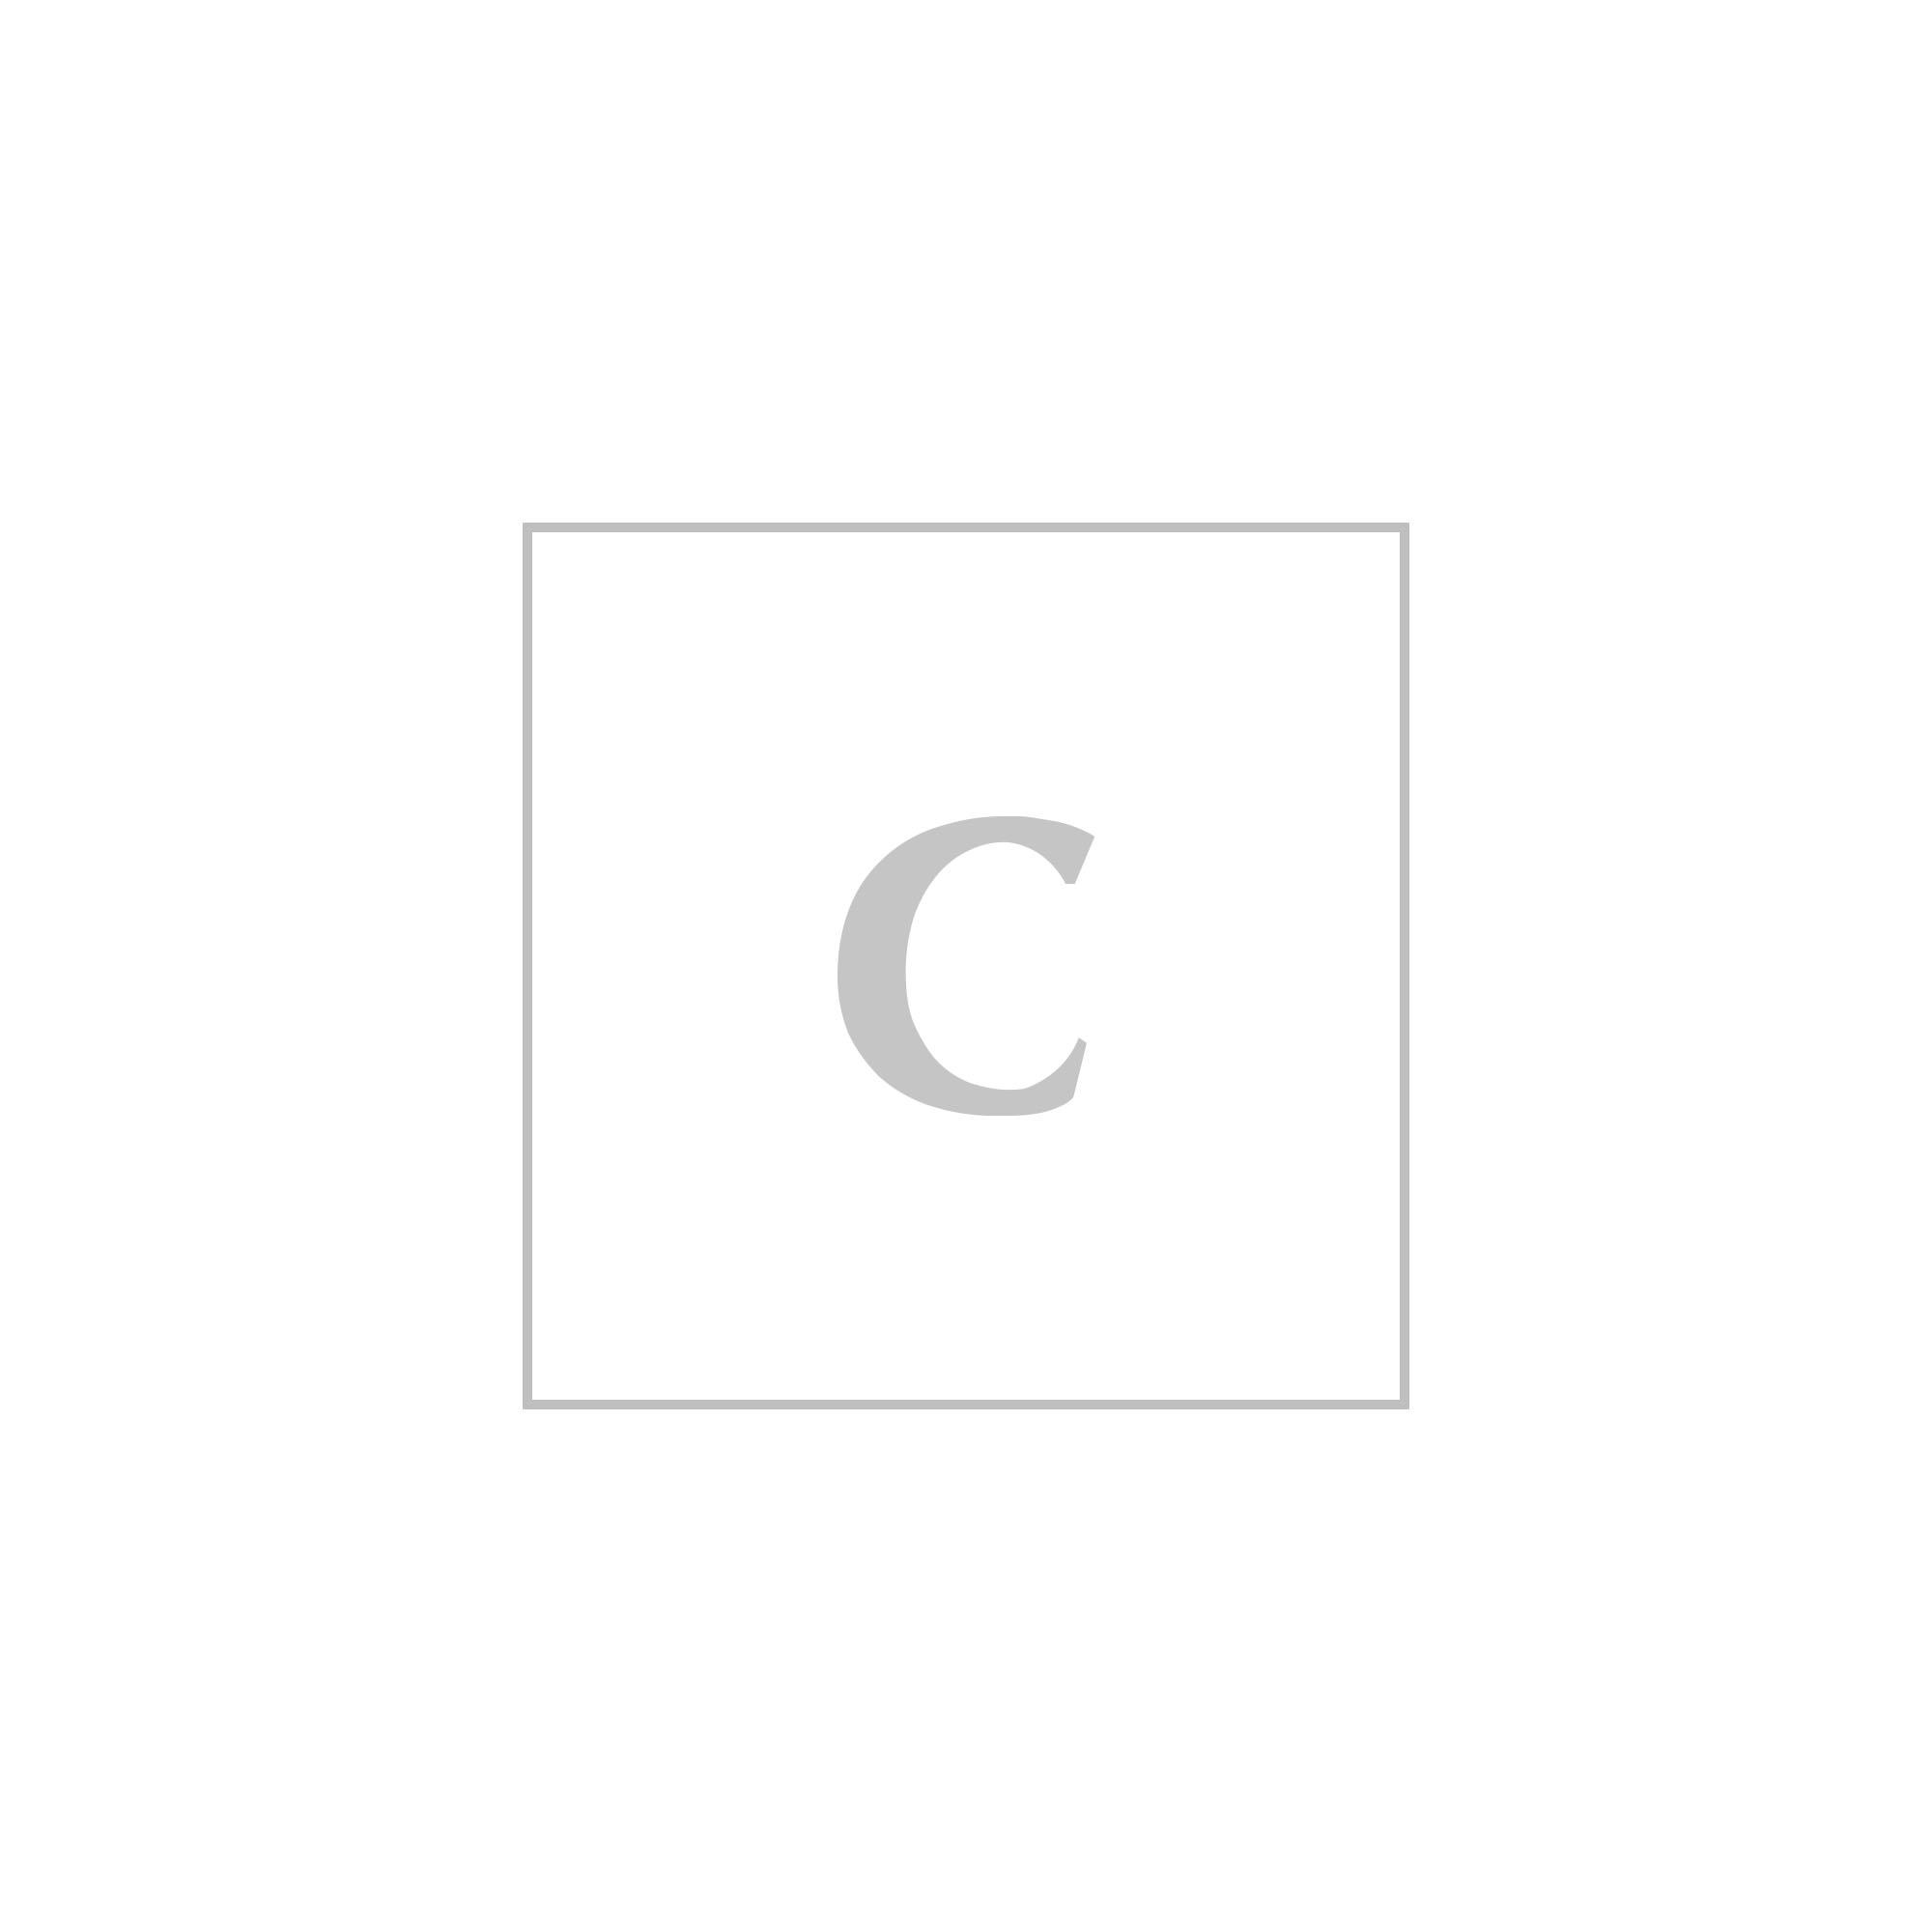 Dolce & gabbana p.foglio vitello stampa dauphine